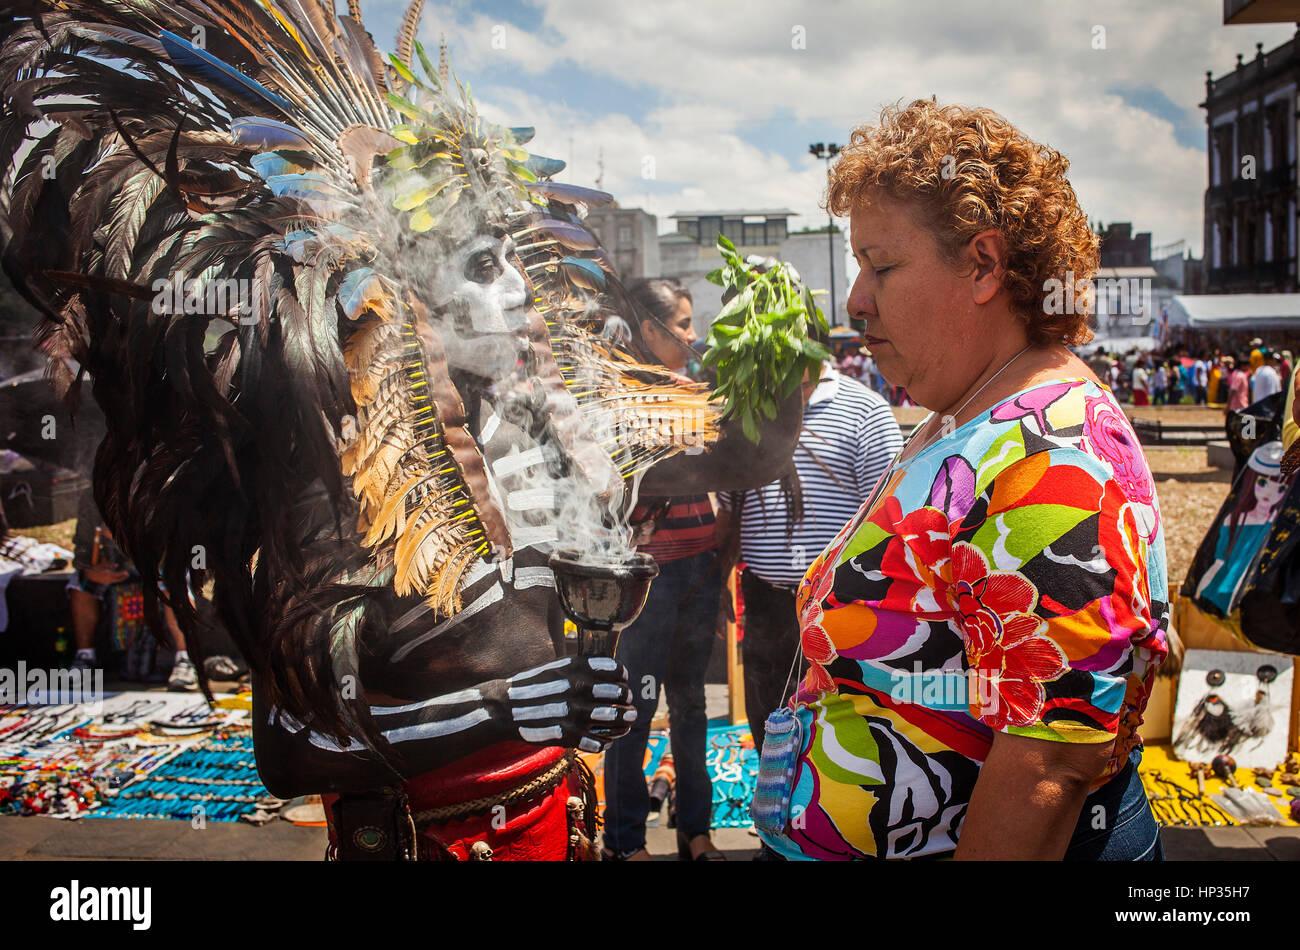 Aztec folk healer, shaman practising spiritual cleansing,Plaza de la Constitución, El Zocalo, Zocalo Square, - Stock Image